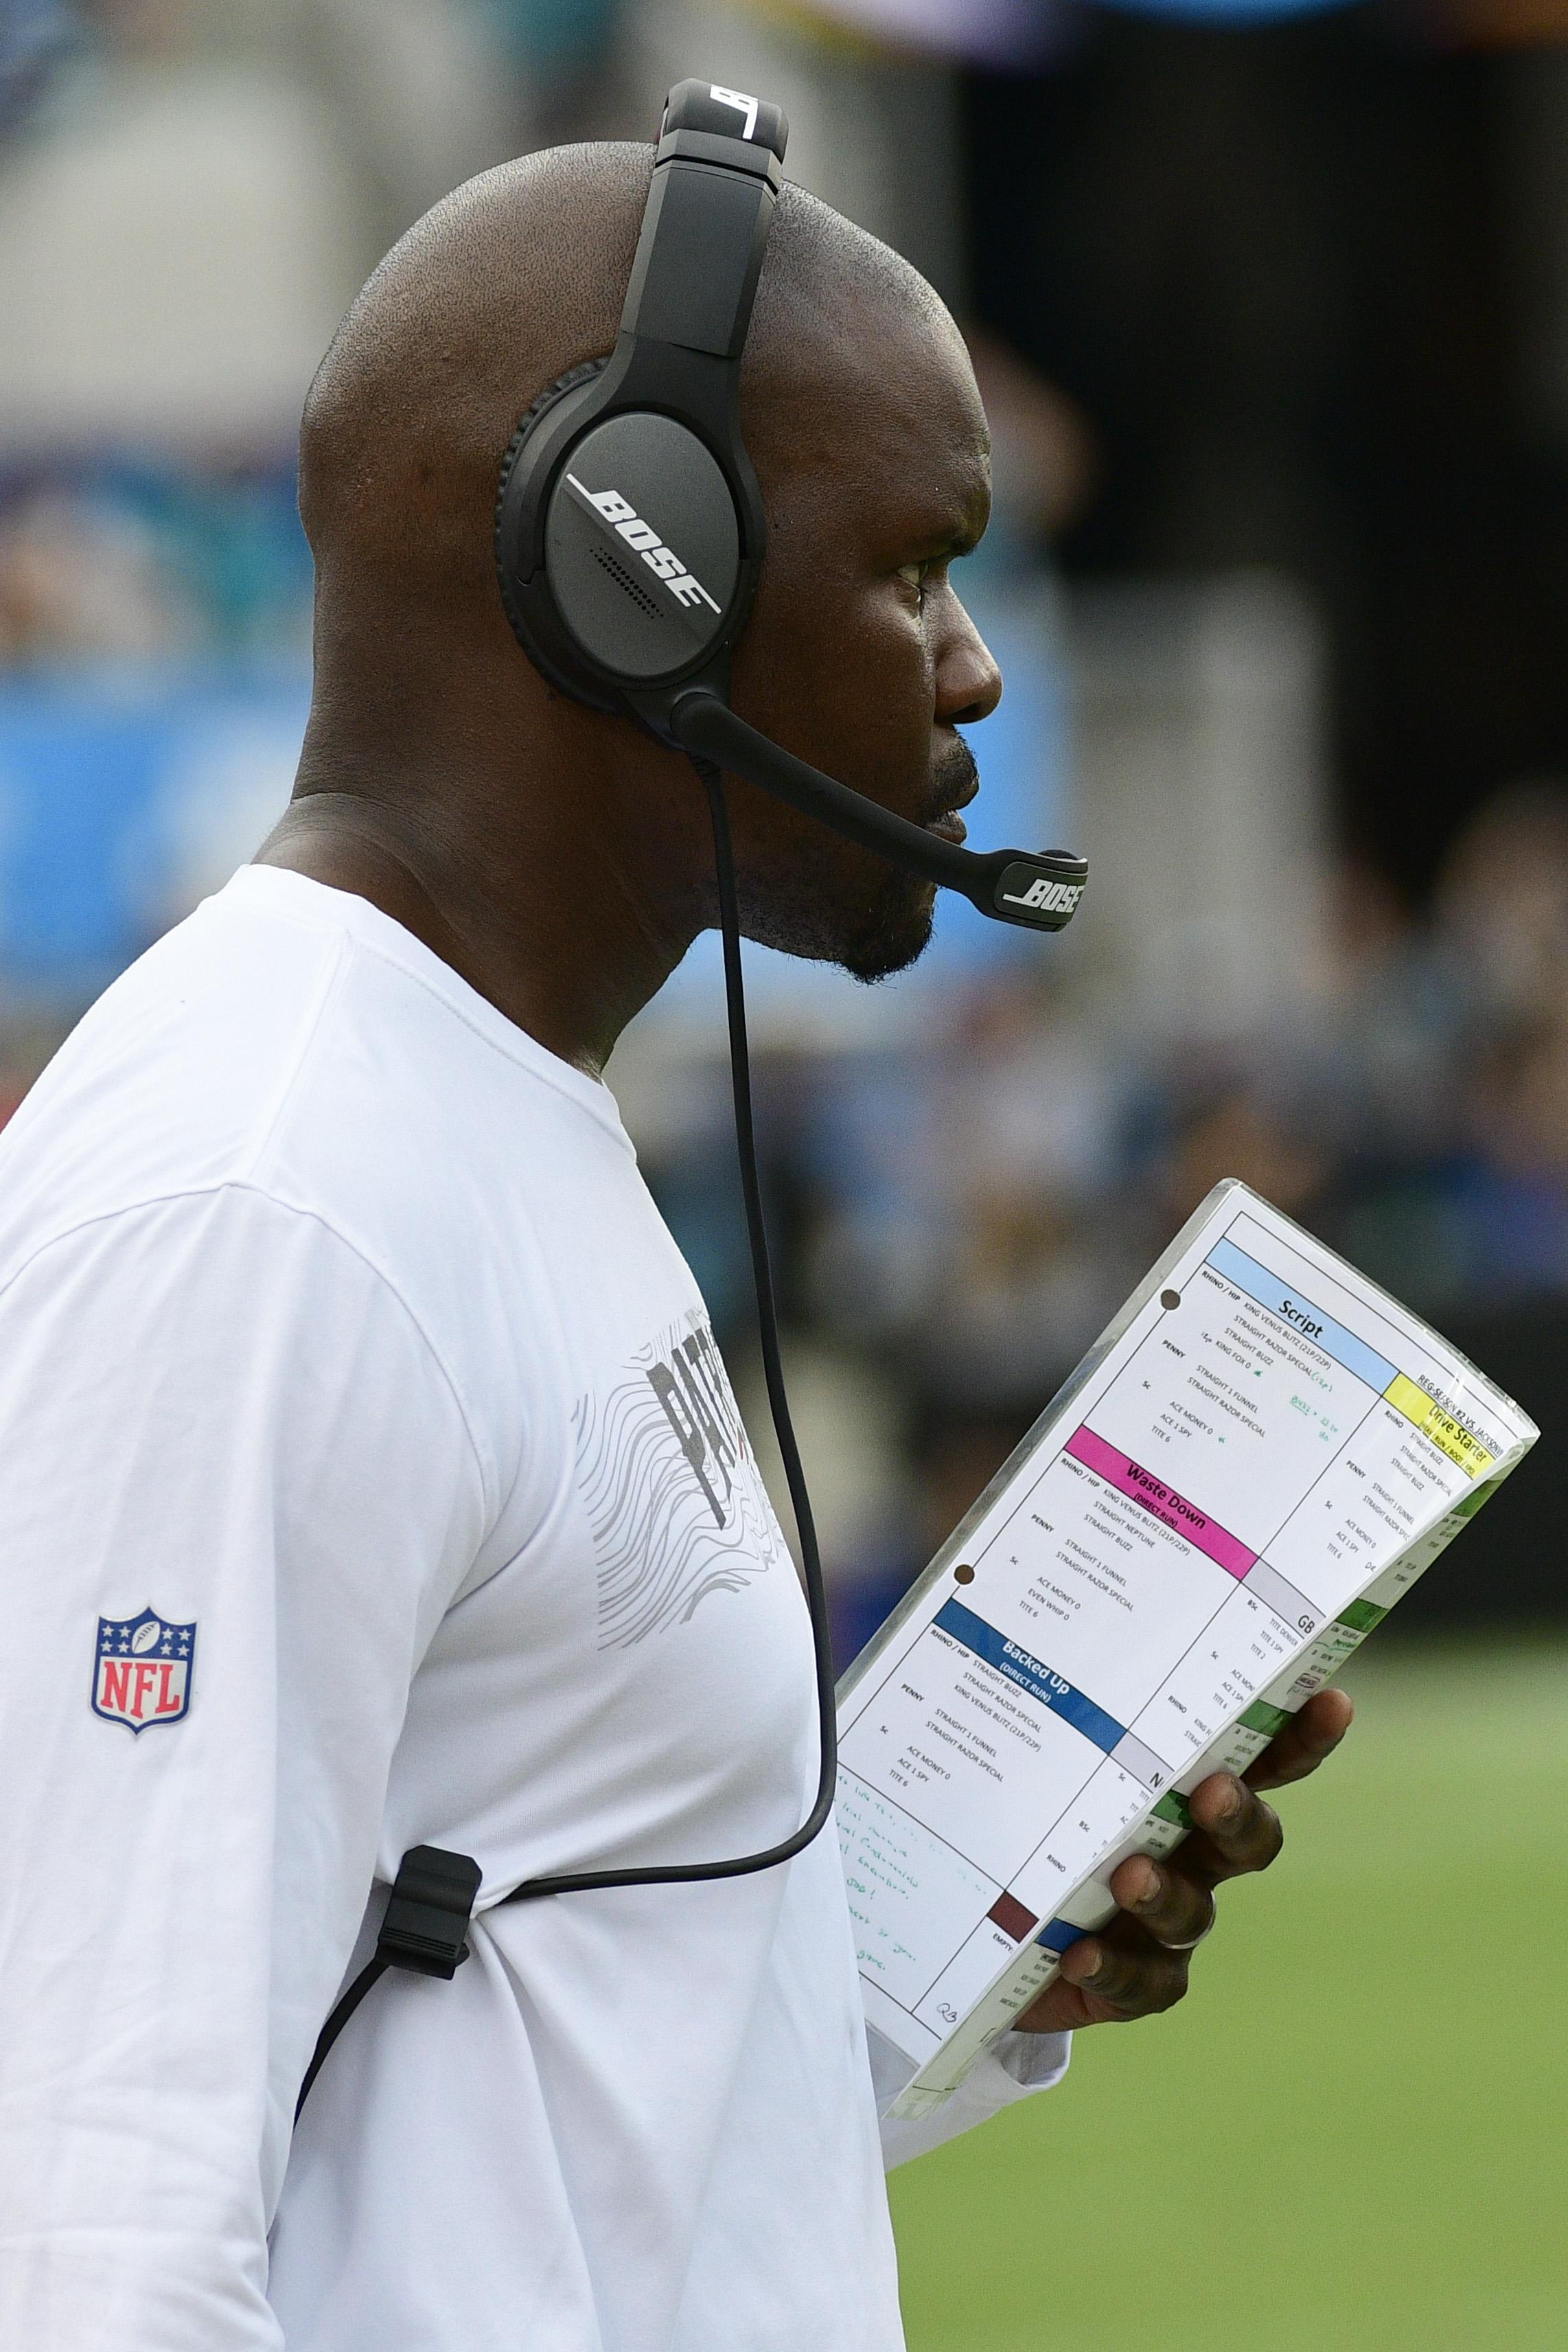 NFL: New England Patriots at Jacksonville Jaguars